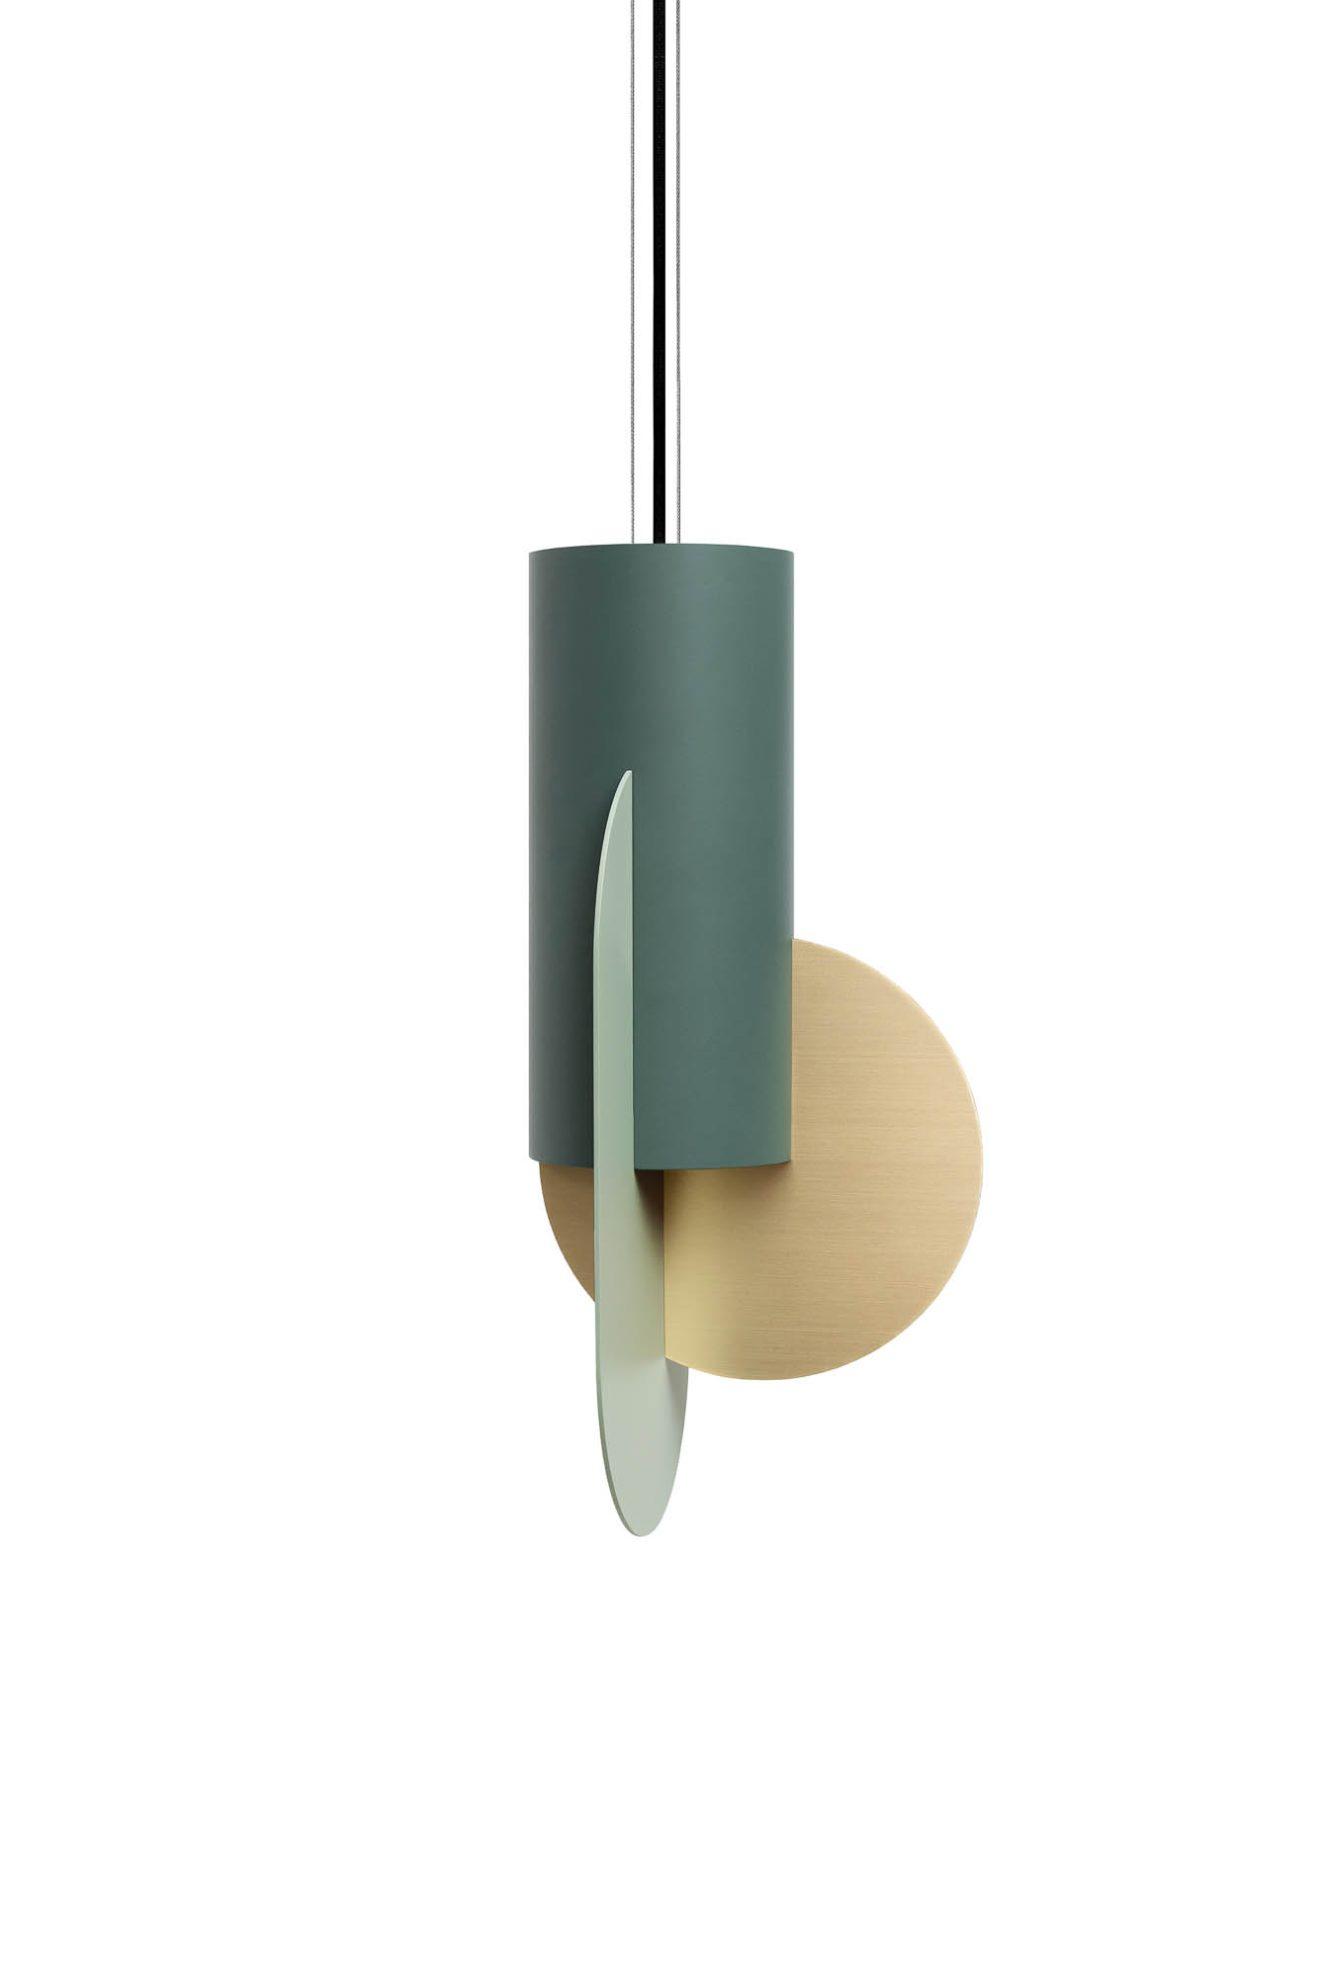 Noom-Suprematic-Lamp-CS5-14